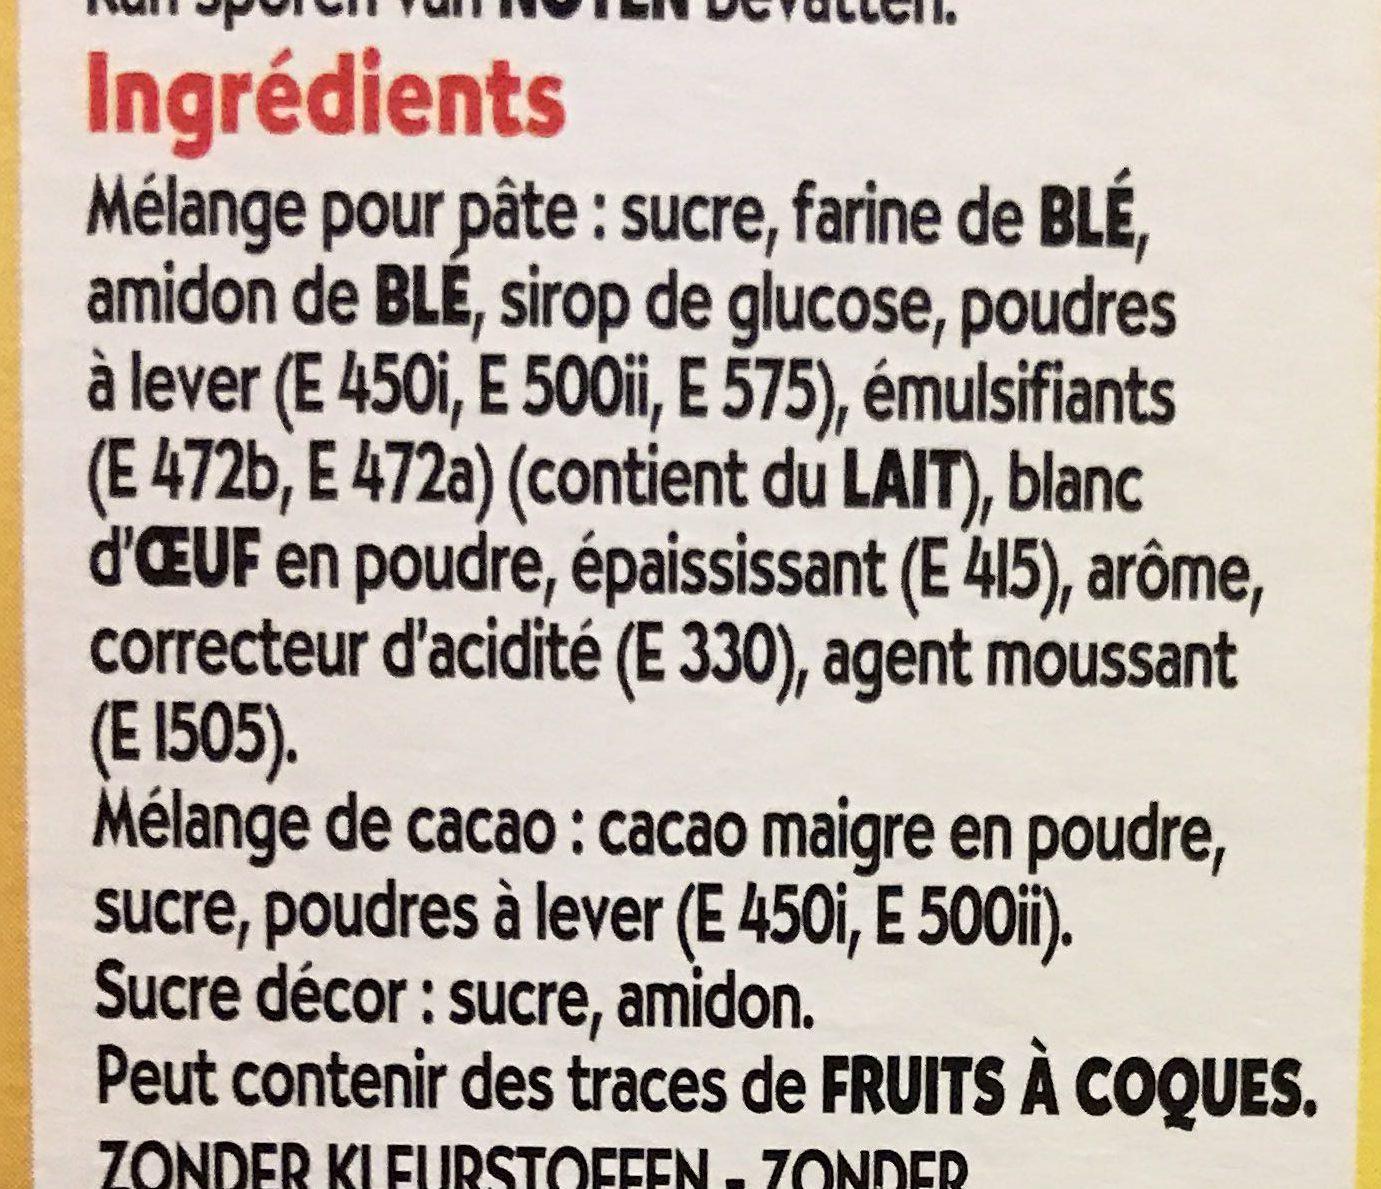 Cake Cœur de Nuage Marbré - Ingrediënten